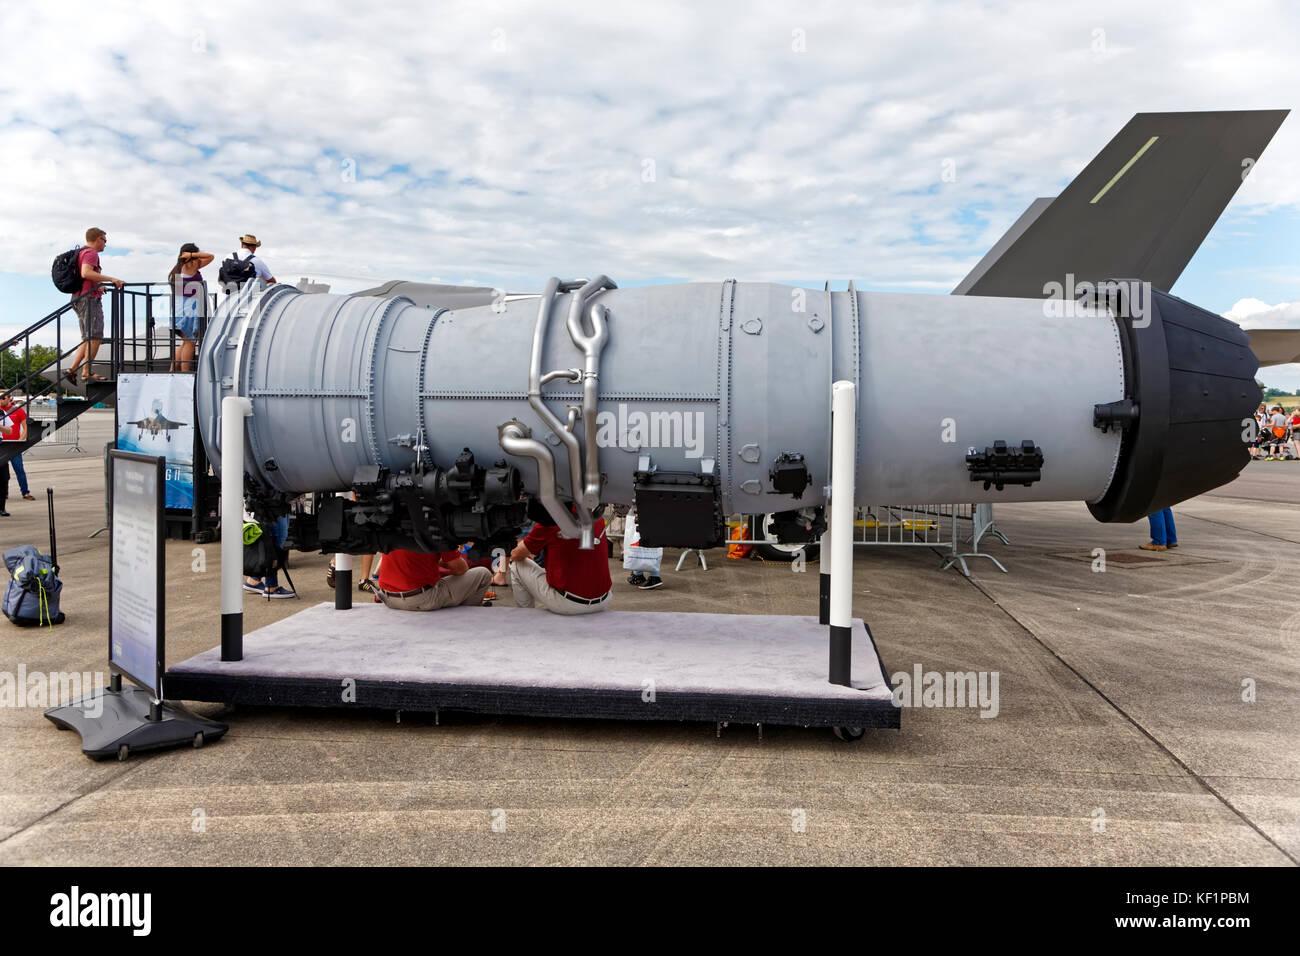 An F-35B Lightning II Pratt & Whitney F135 Jet Engine at the RNAS Yeovilton International Air Day 2017 - Stock Image